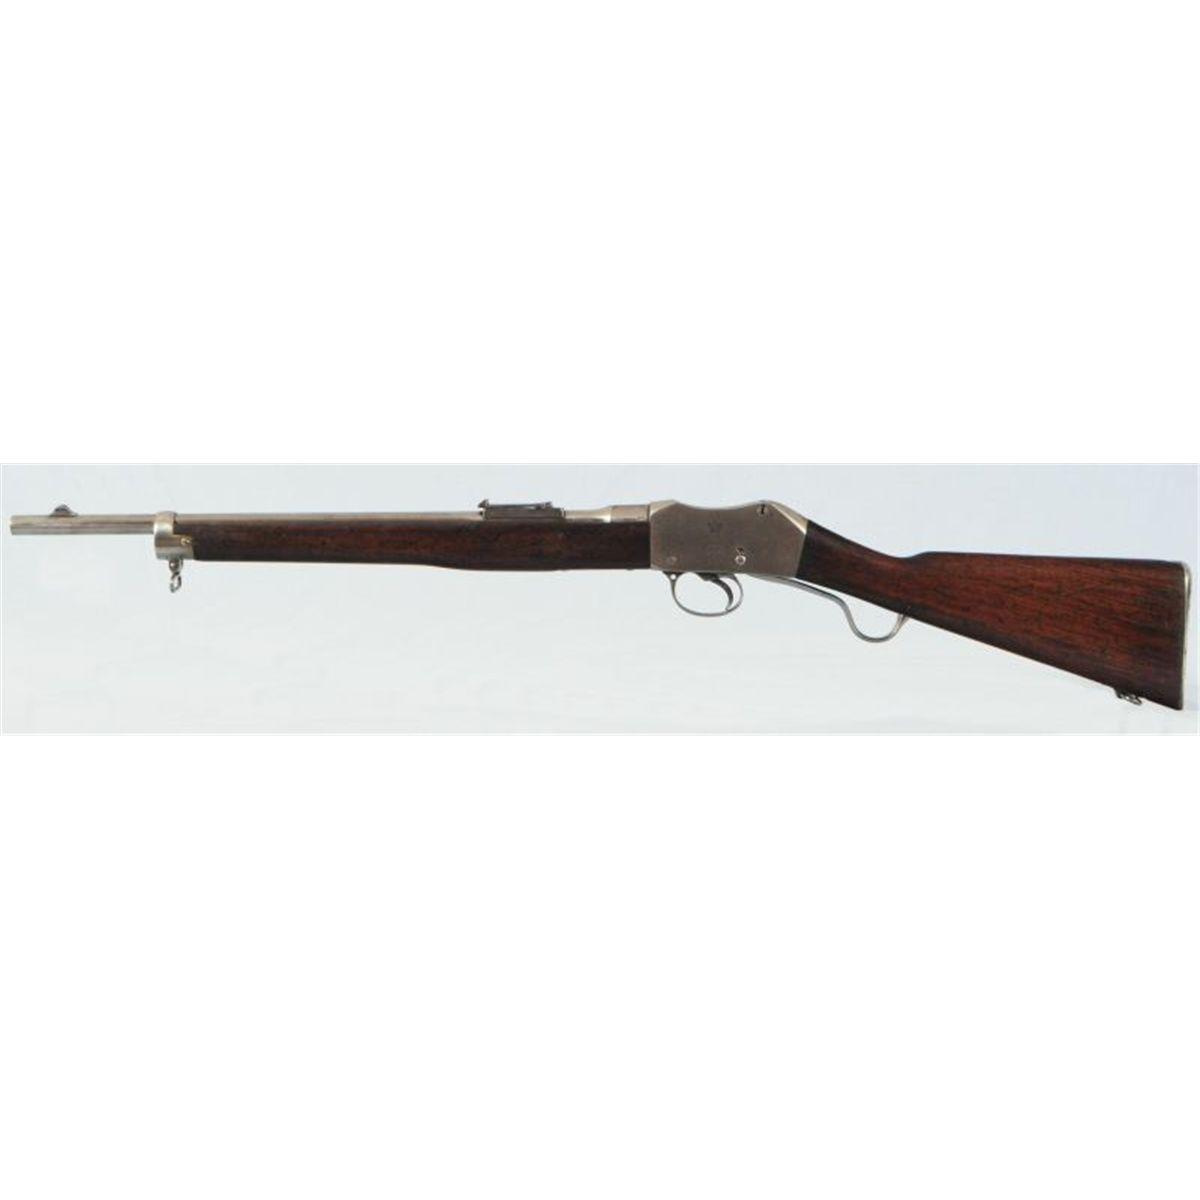 Martini-Henry Breech Loading Carbine  303